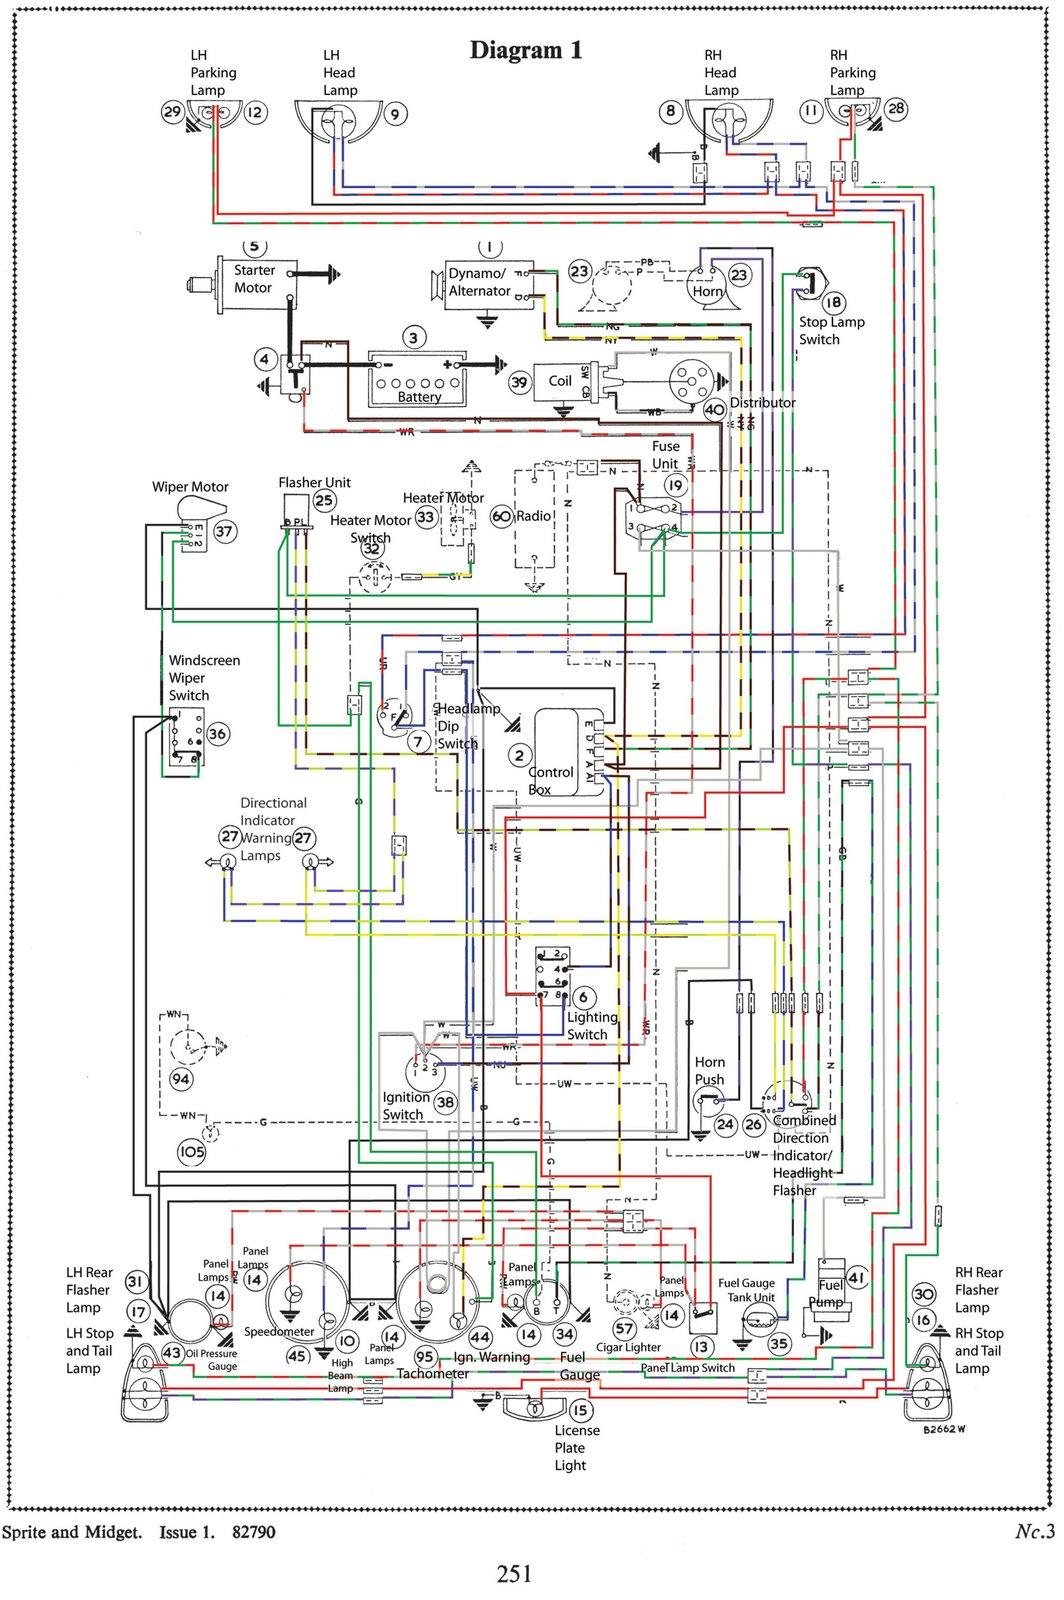 medium resolution of 1975 mgb fuse box search for wiring diagrams u2022 rh stephenpoon co 1980 mgb fuse box